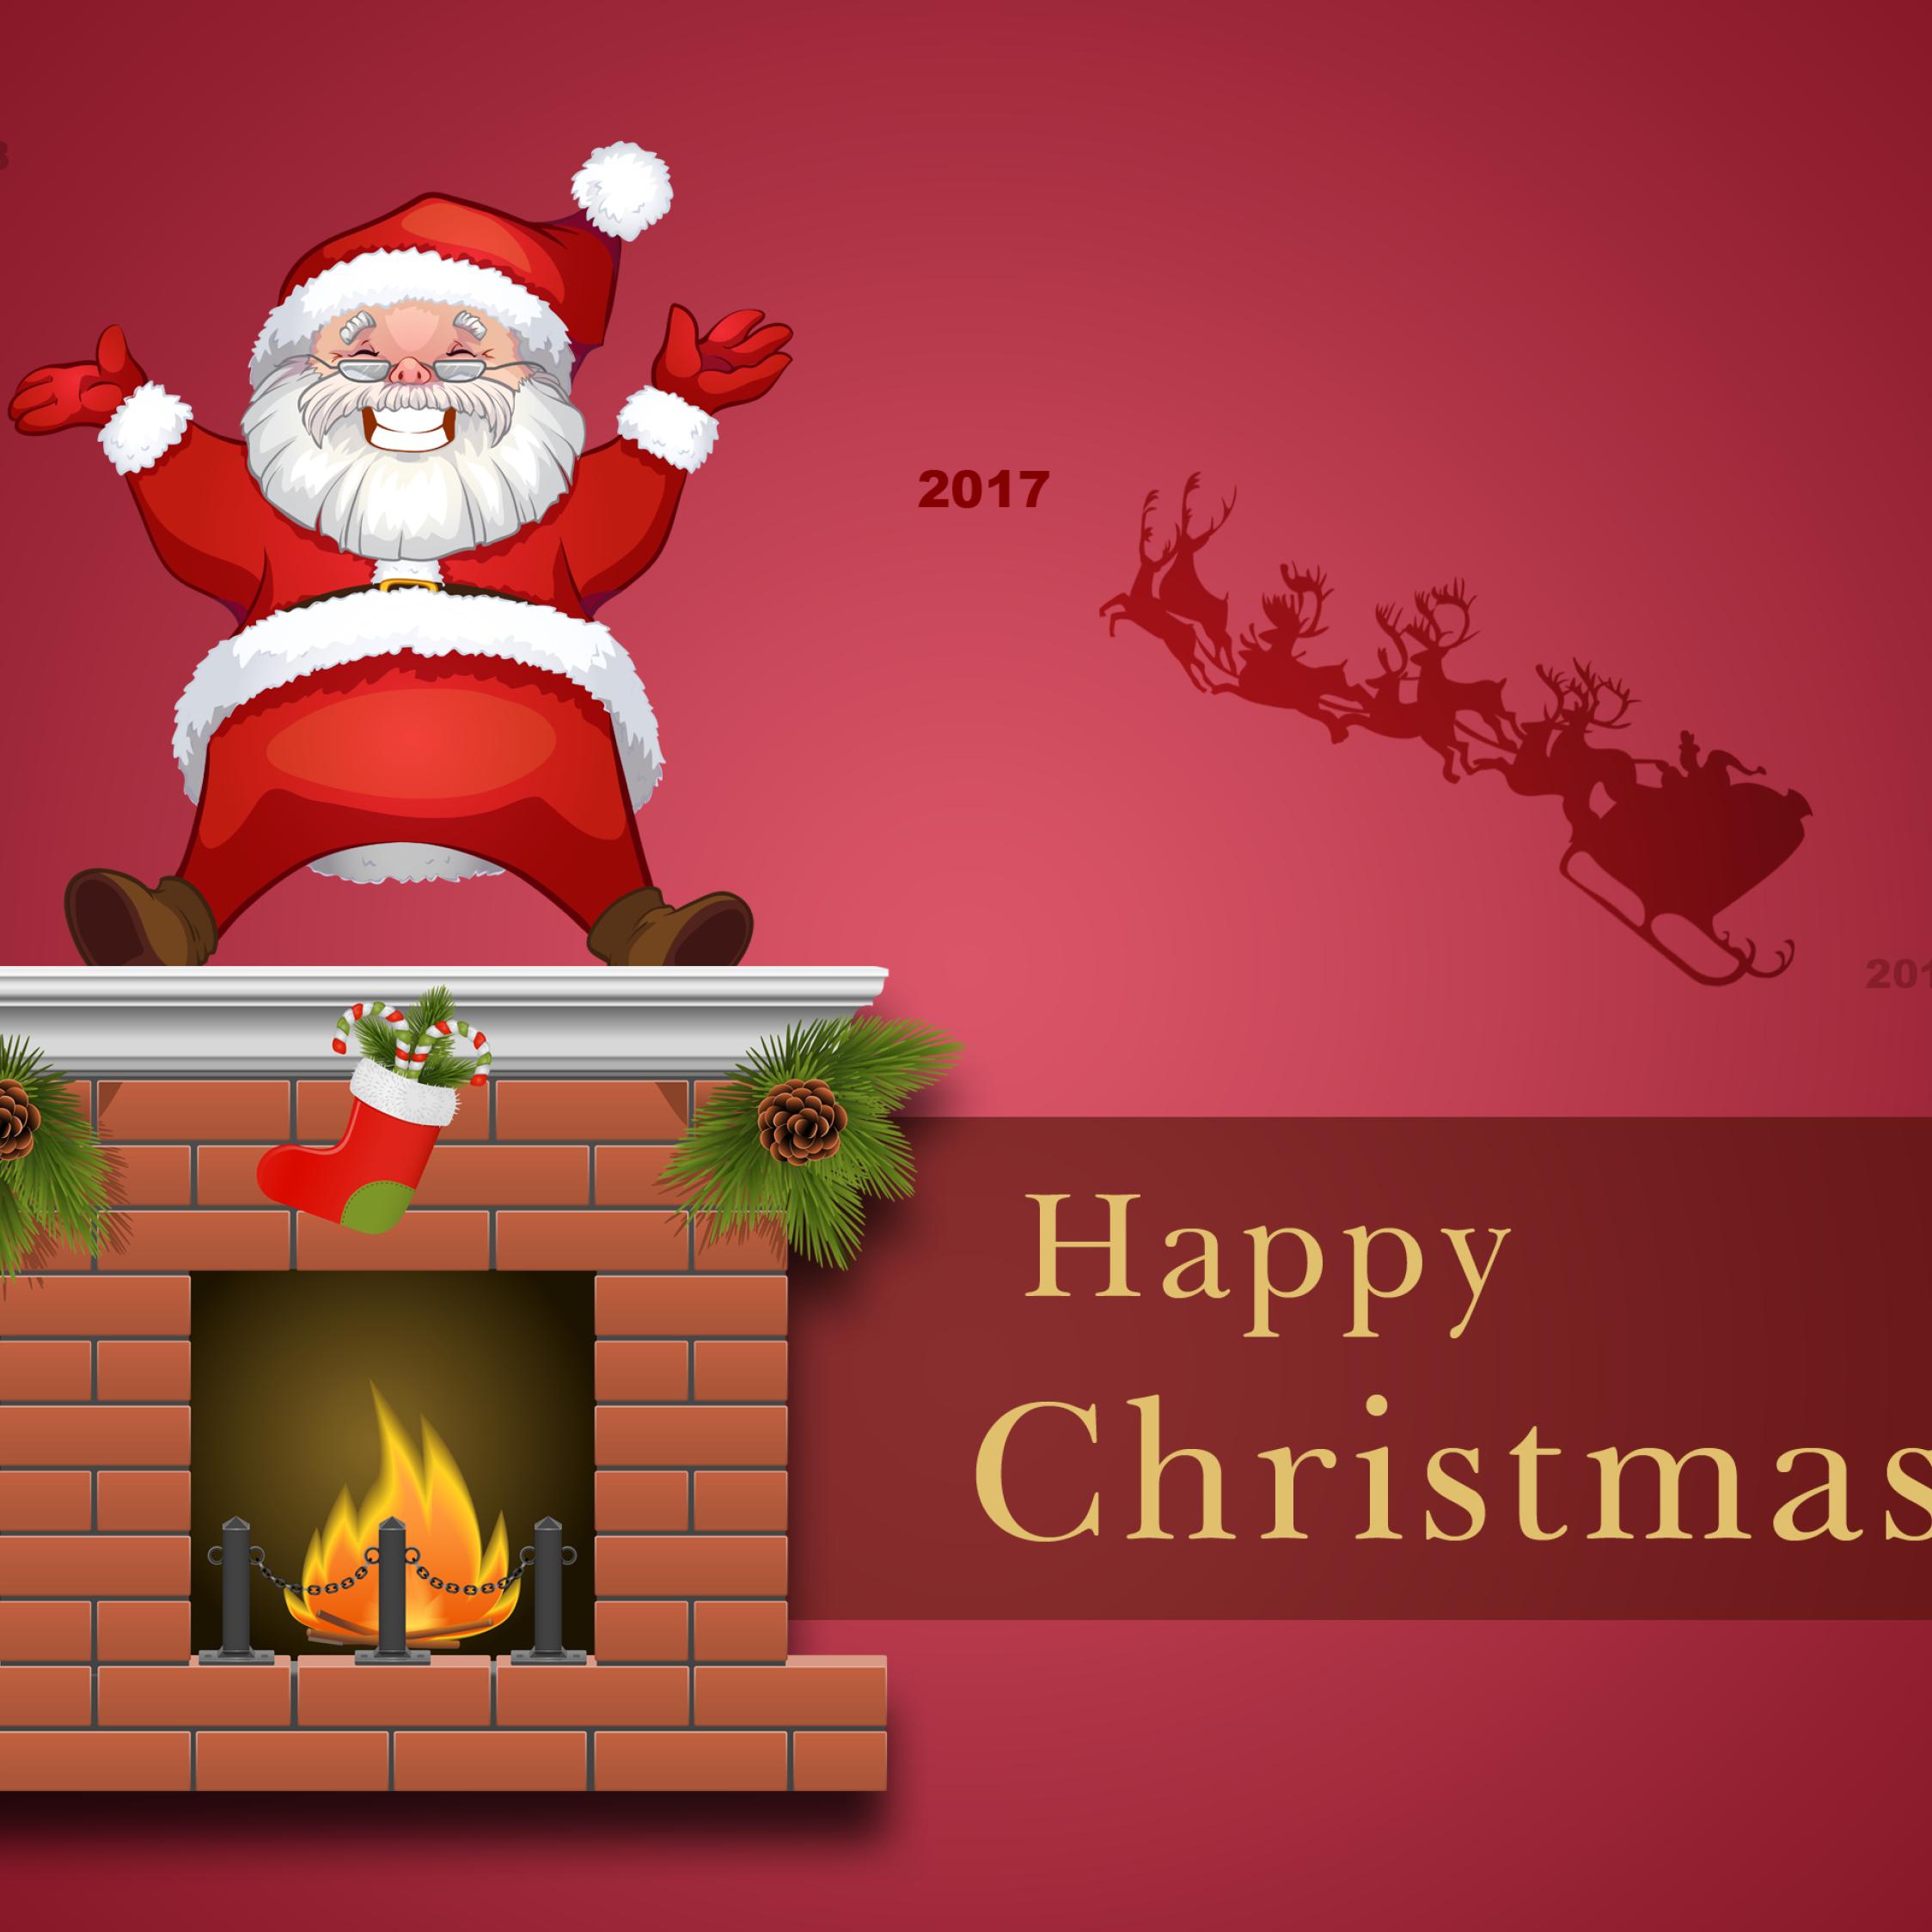 Download Happy Christmas 2017 1680x1050 Resolution Full HD 2K Wallpaper